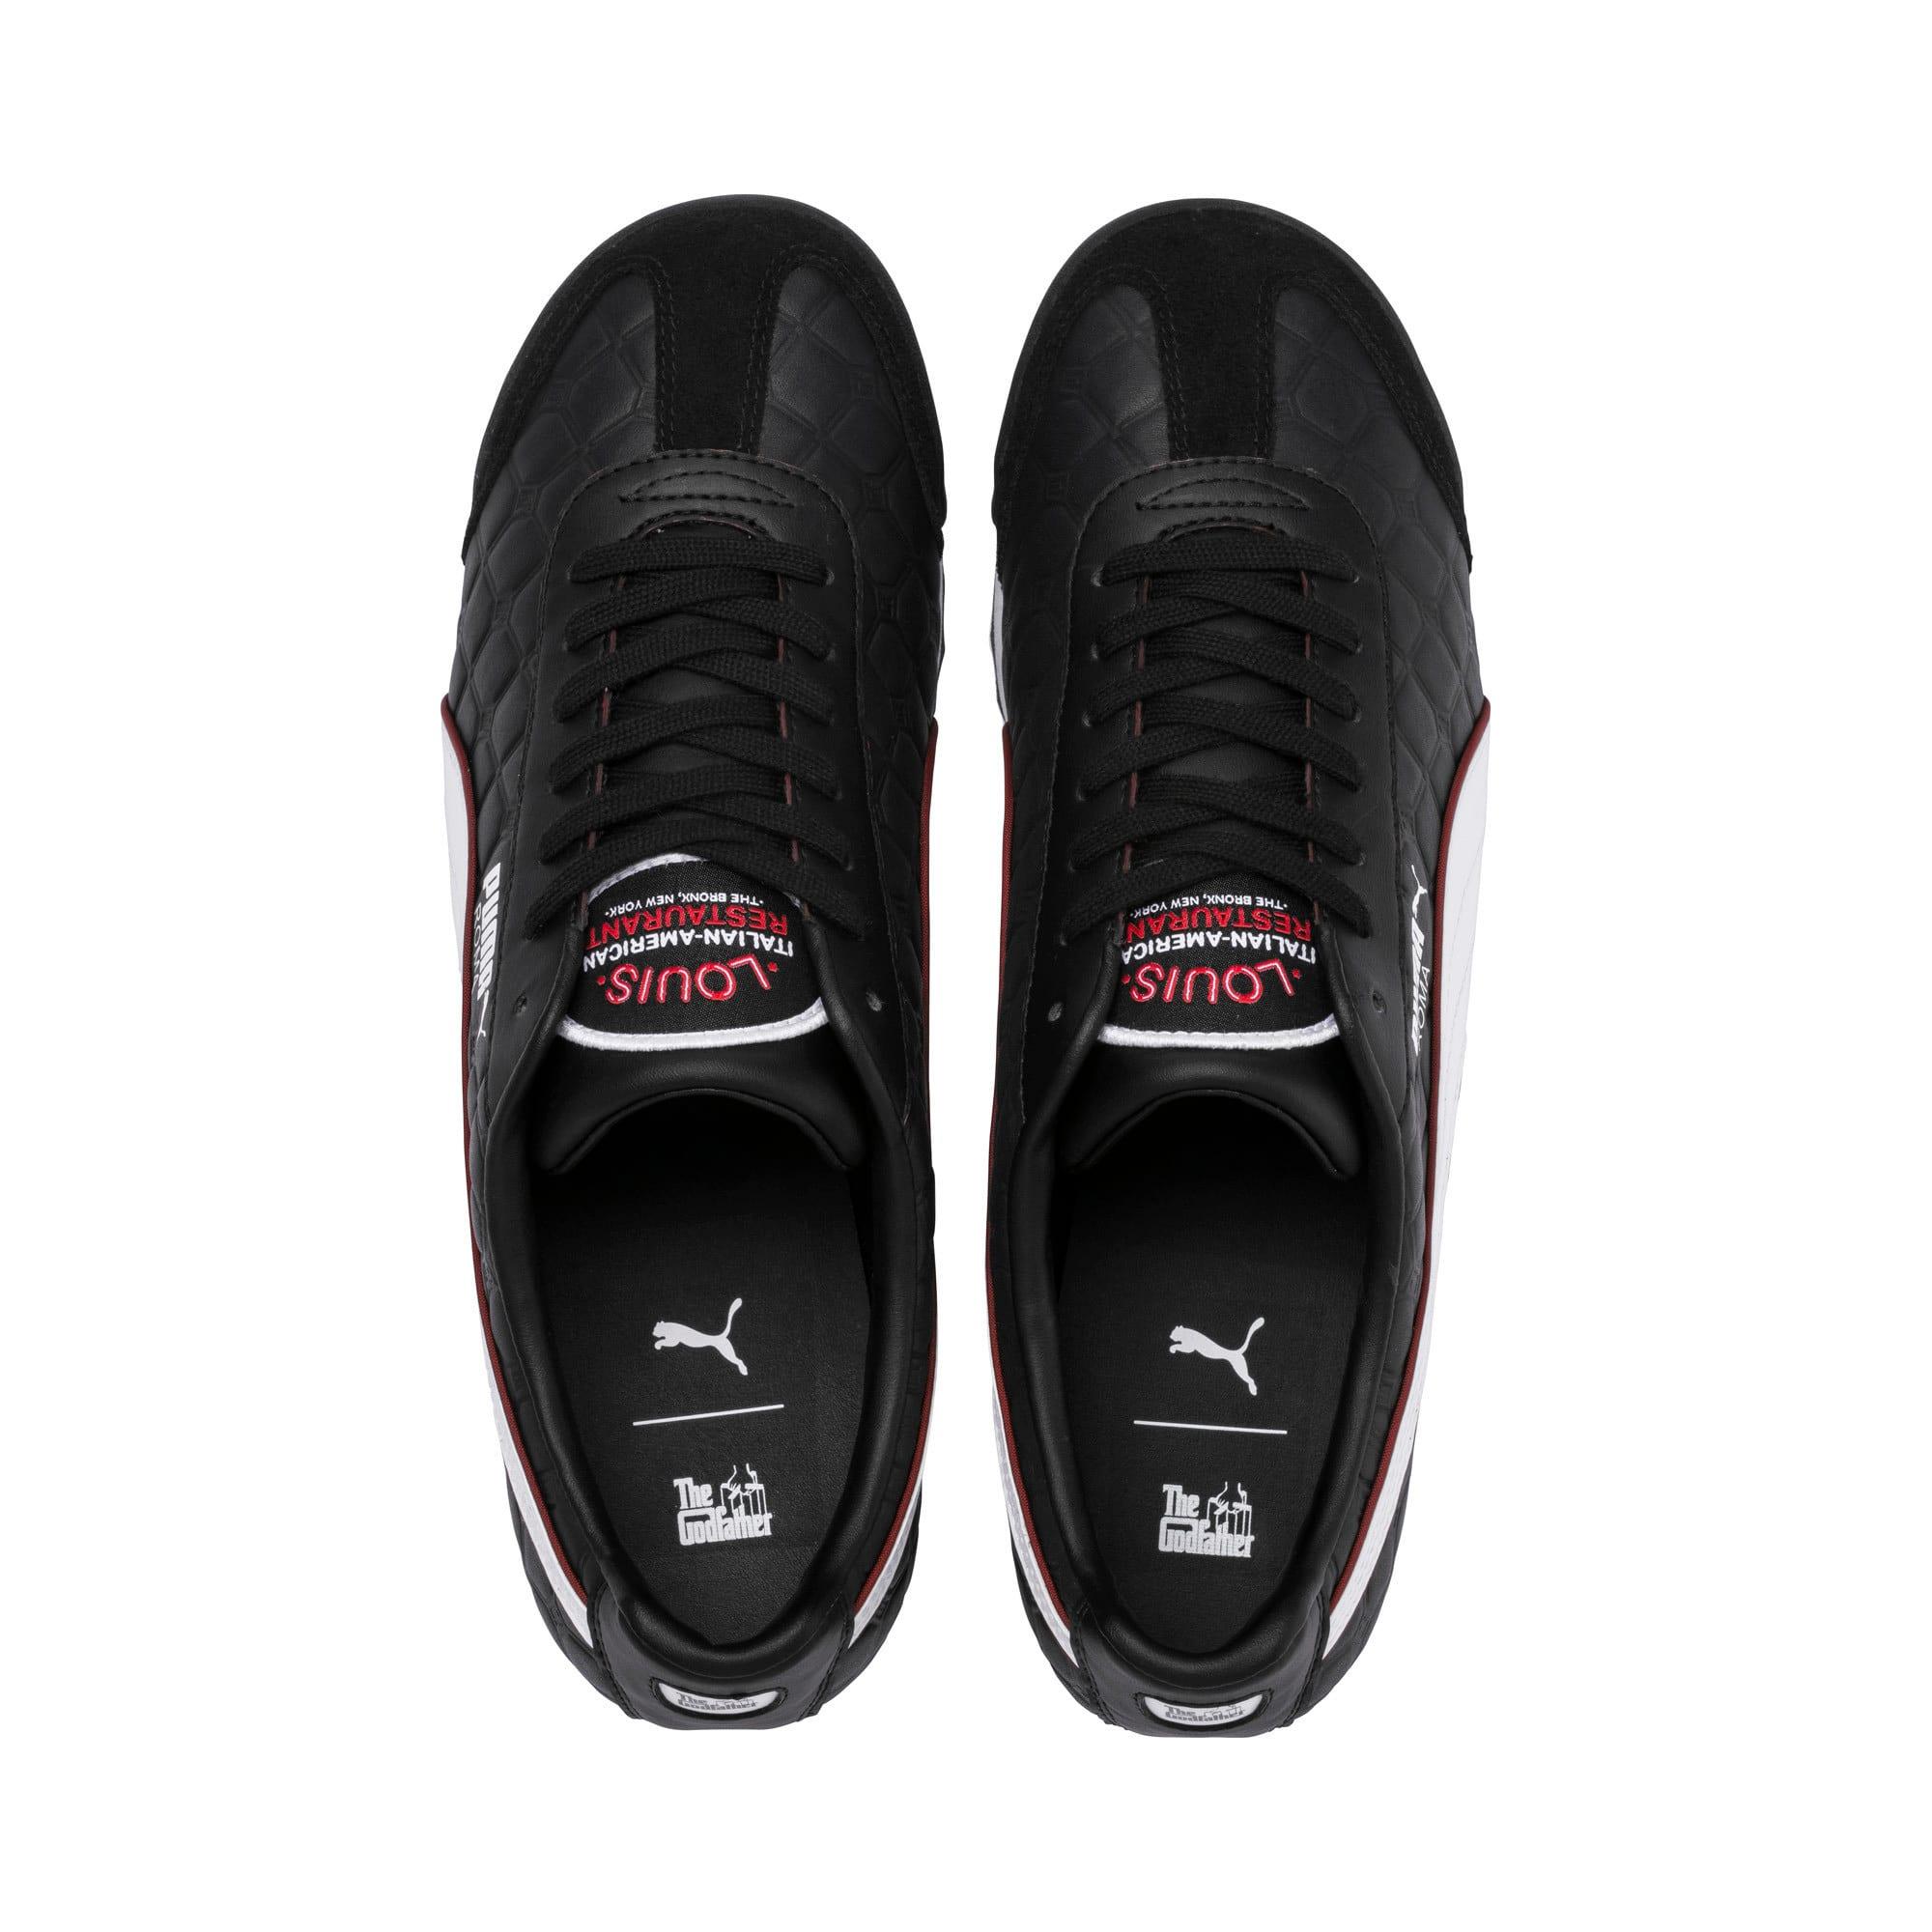 Miniatura 6 de Zapatos deportivos PUMA x THE GODFATHER Roma Louis, Puma Black-Fired Brick, mediano